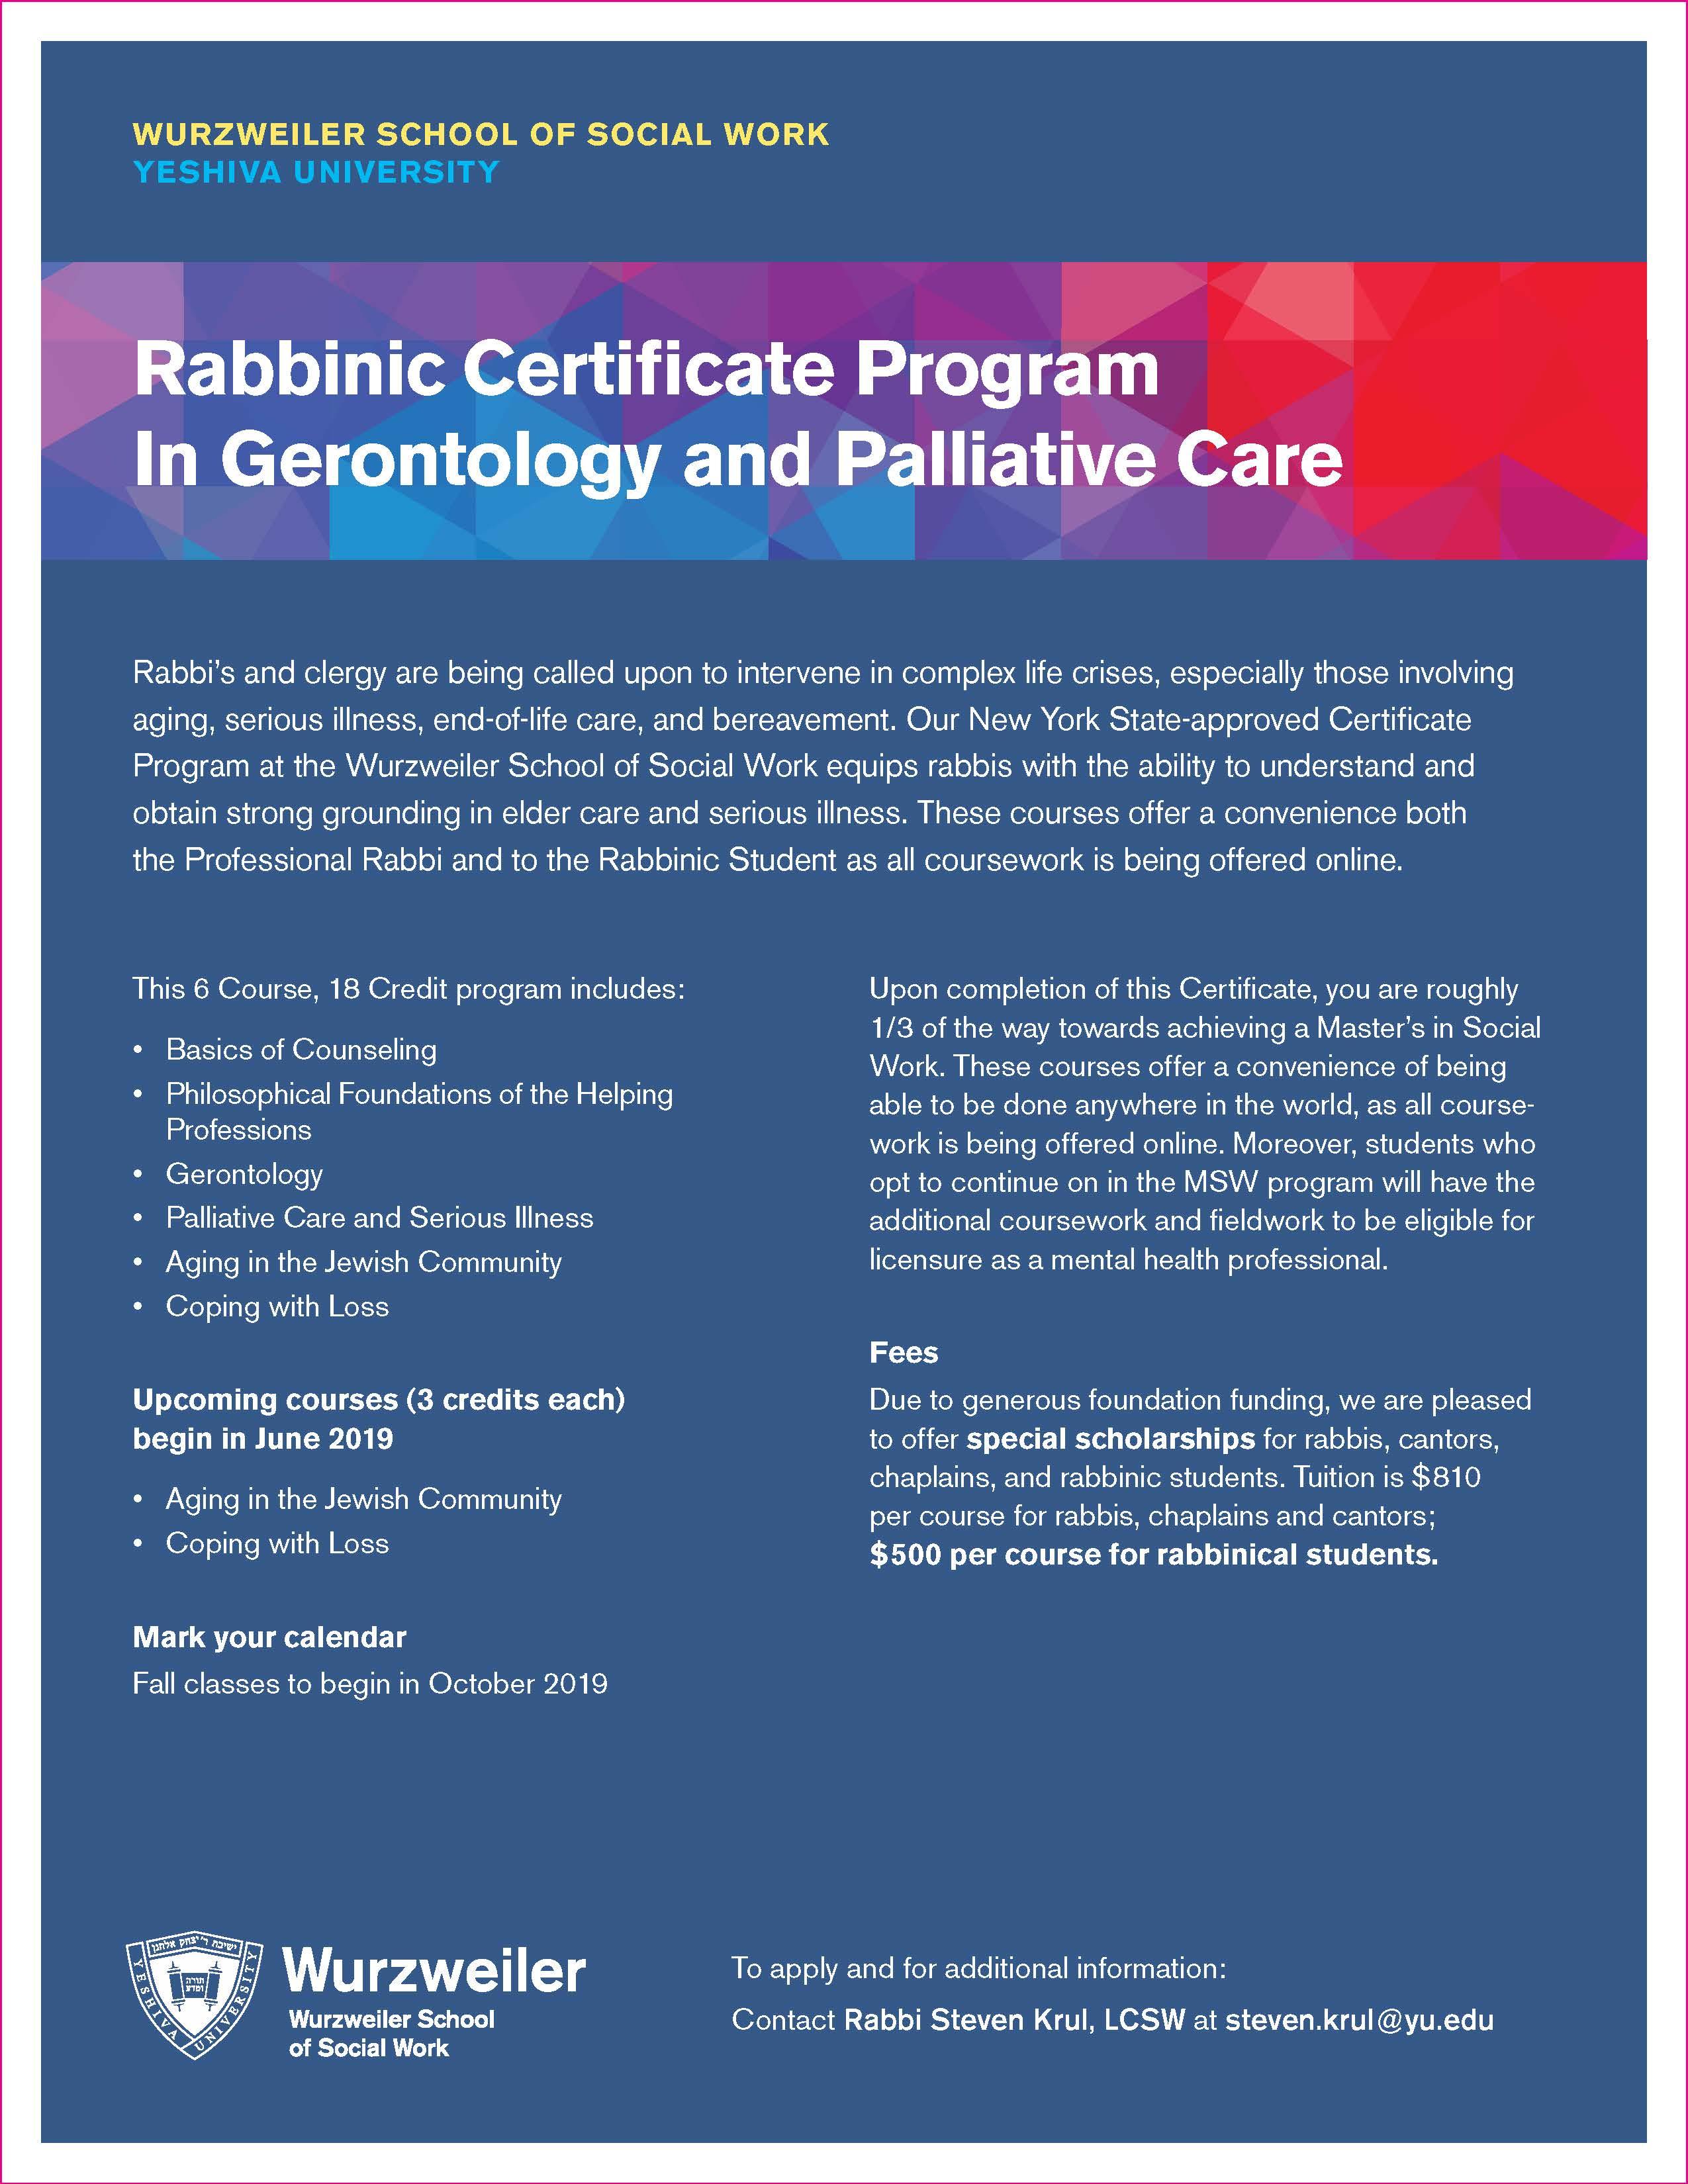 Rabbinic Certificate Program In Gerontology and Palliative